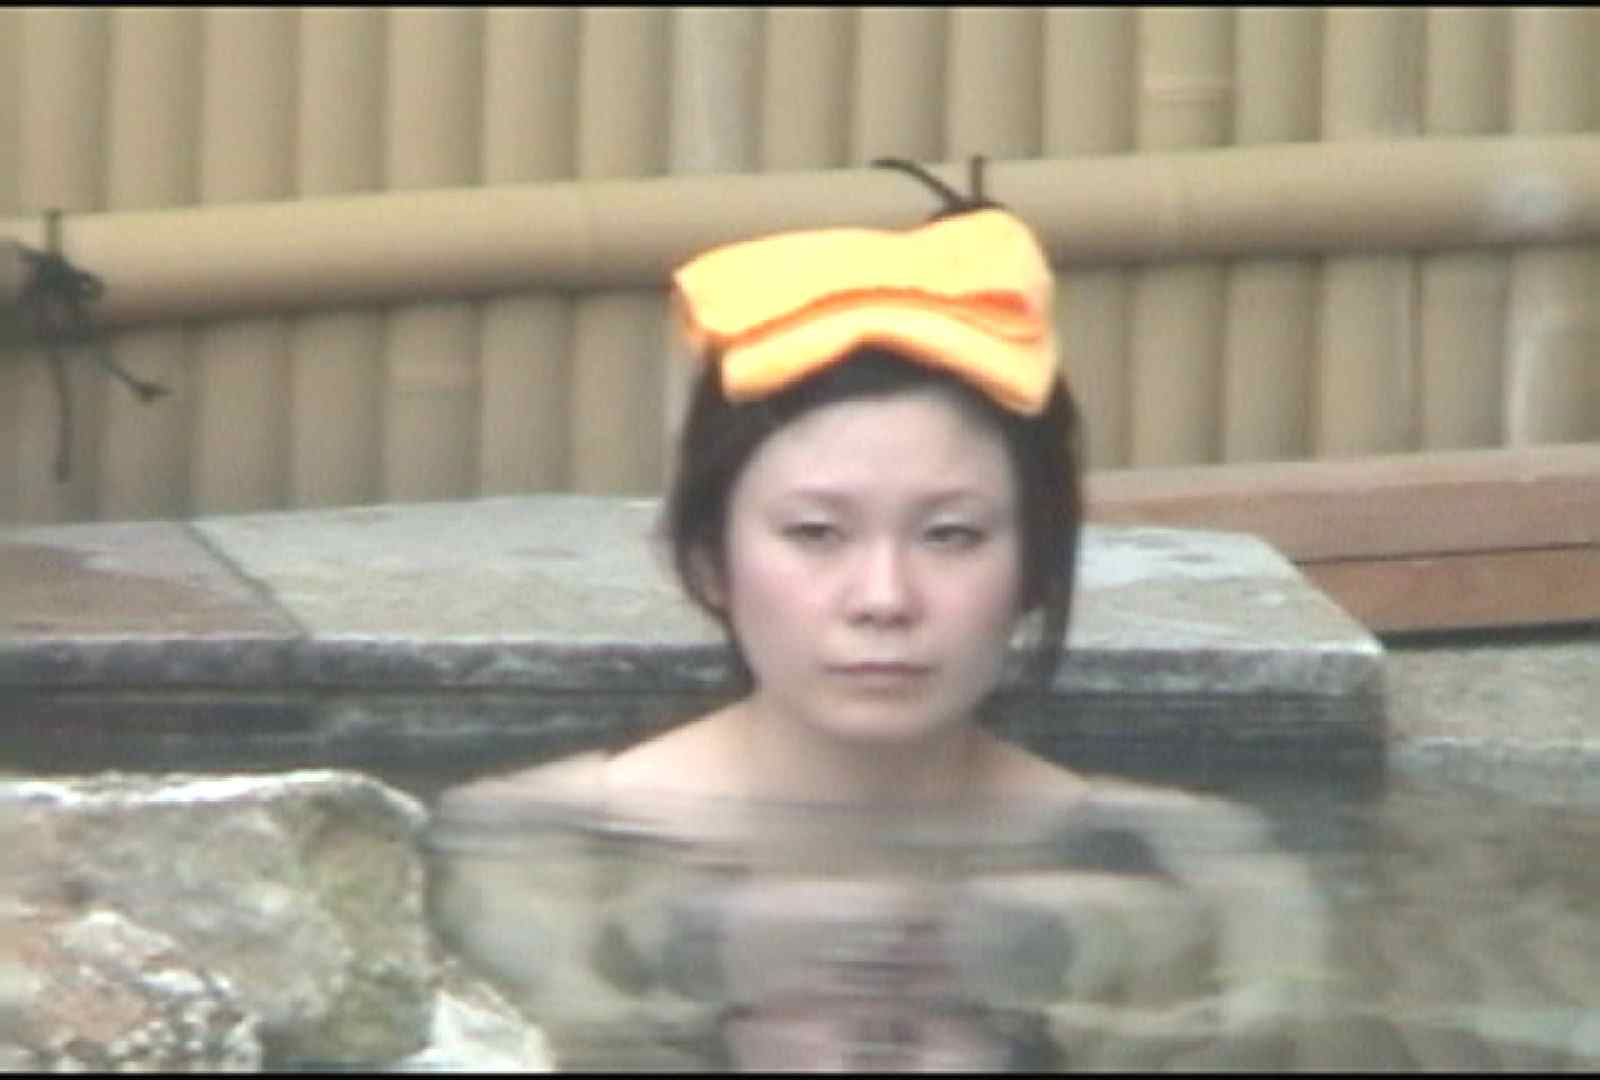 Aquaな露天風呂Vol.177 盗撮師作品  102pic 66